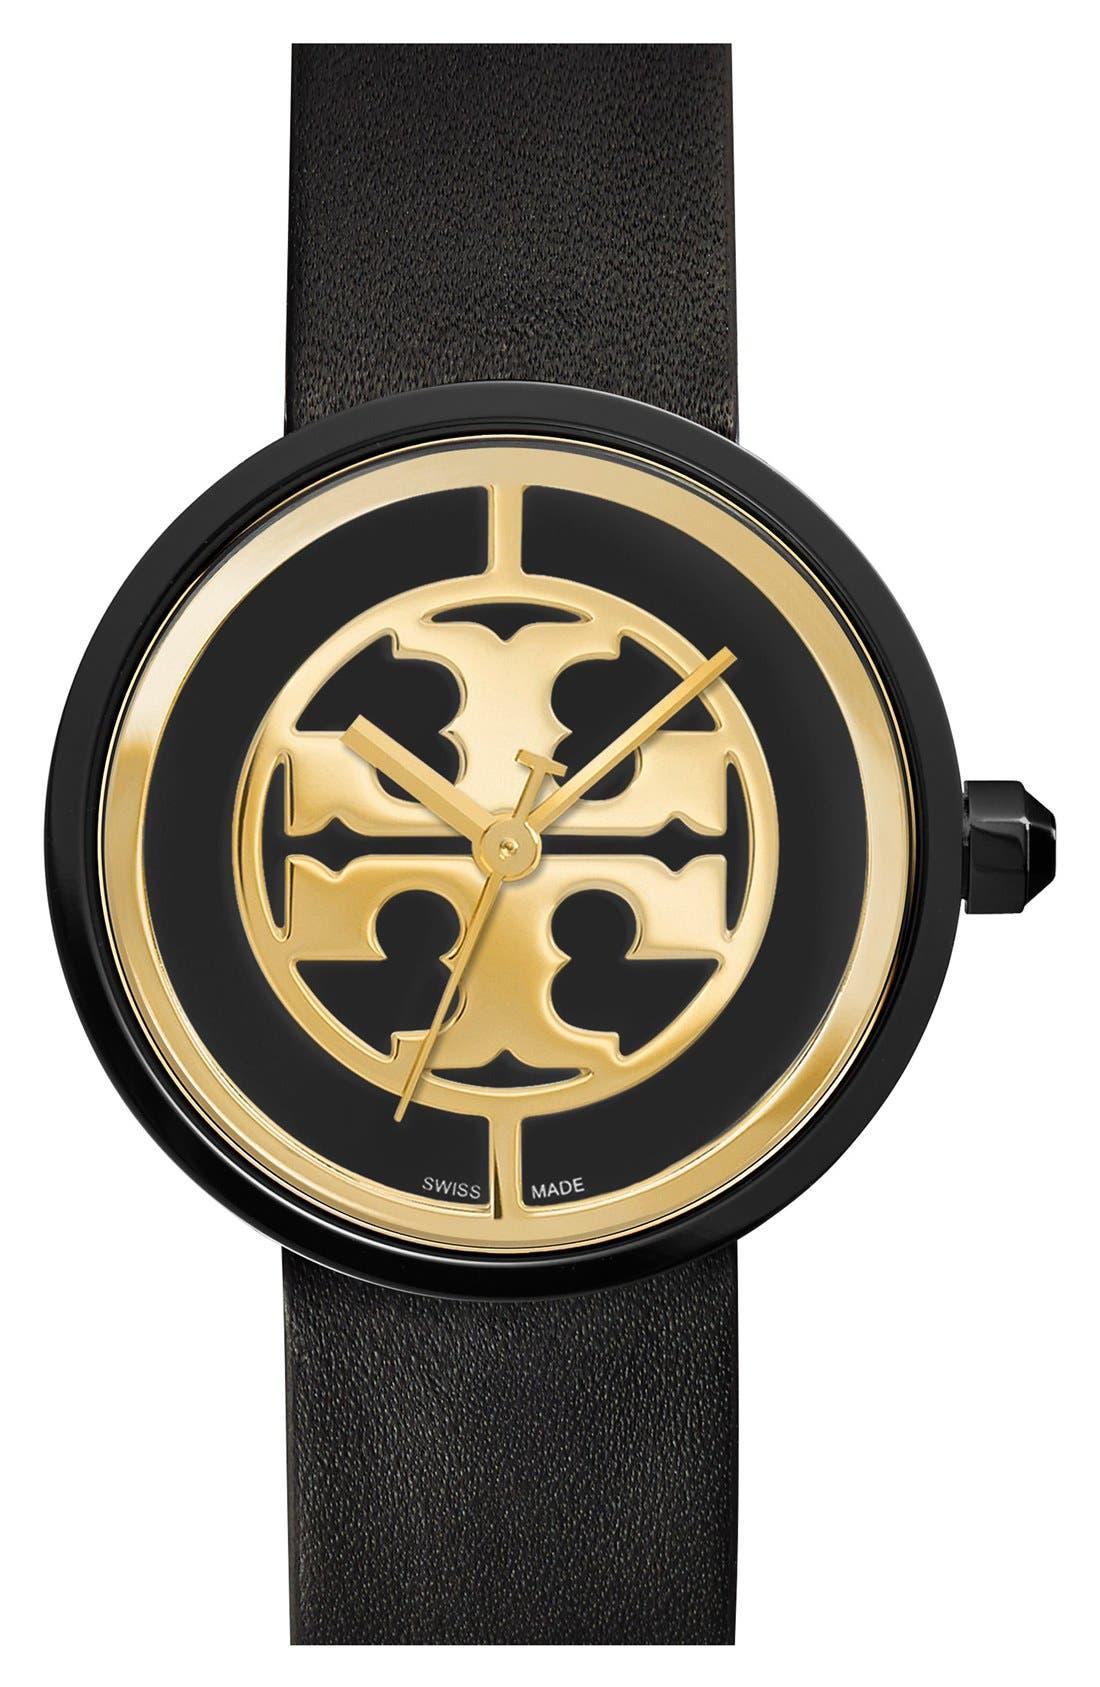 Tory Burch 'Reva' Logo Dial LeatherStrap Watch, 36mm